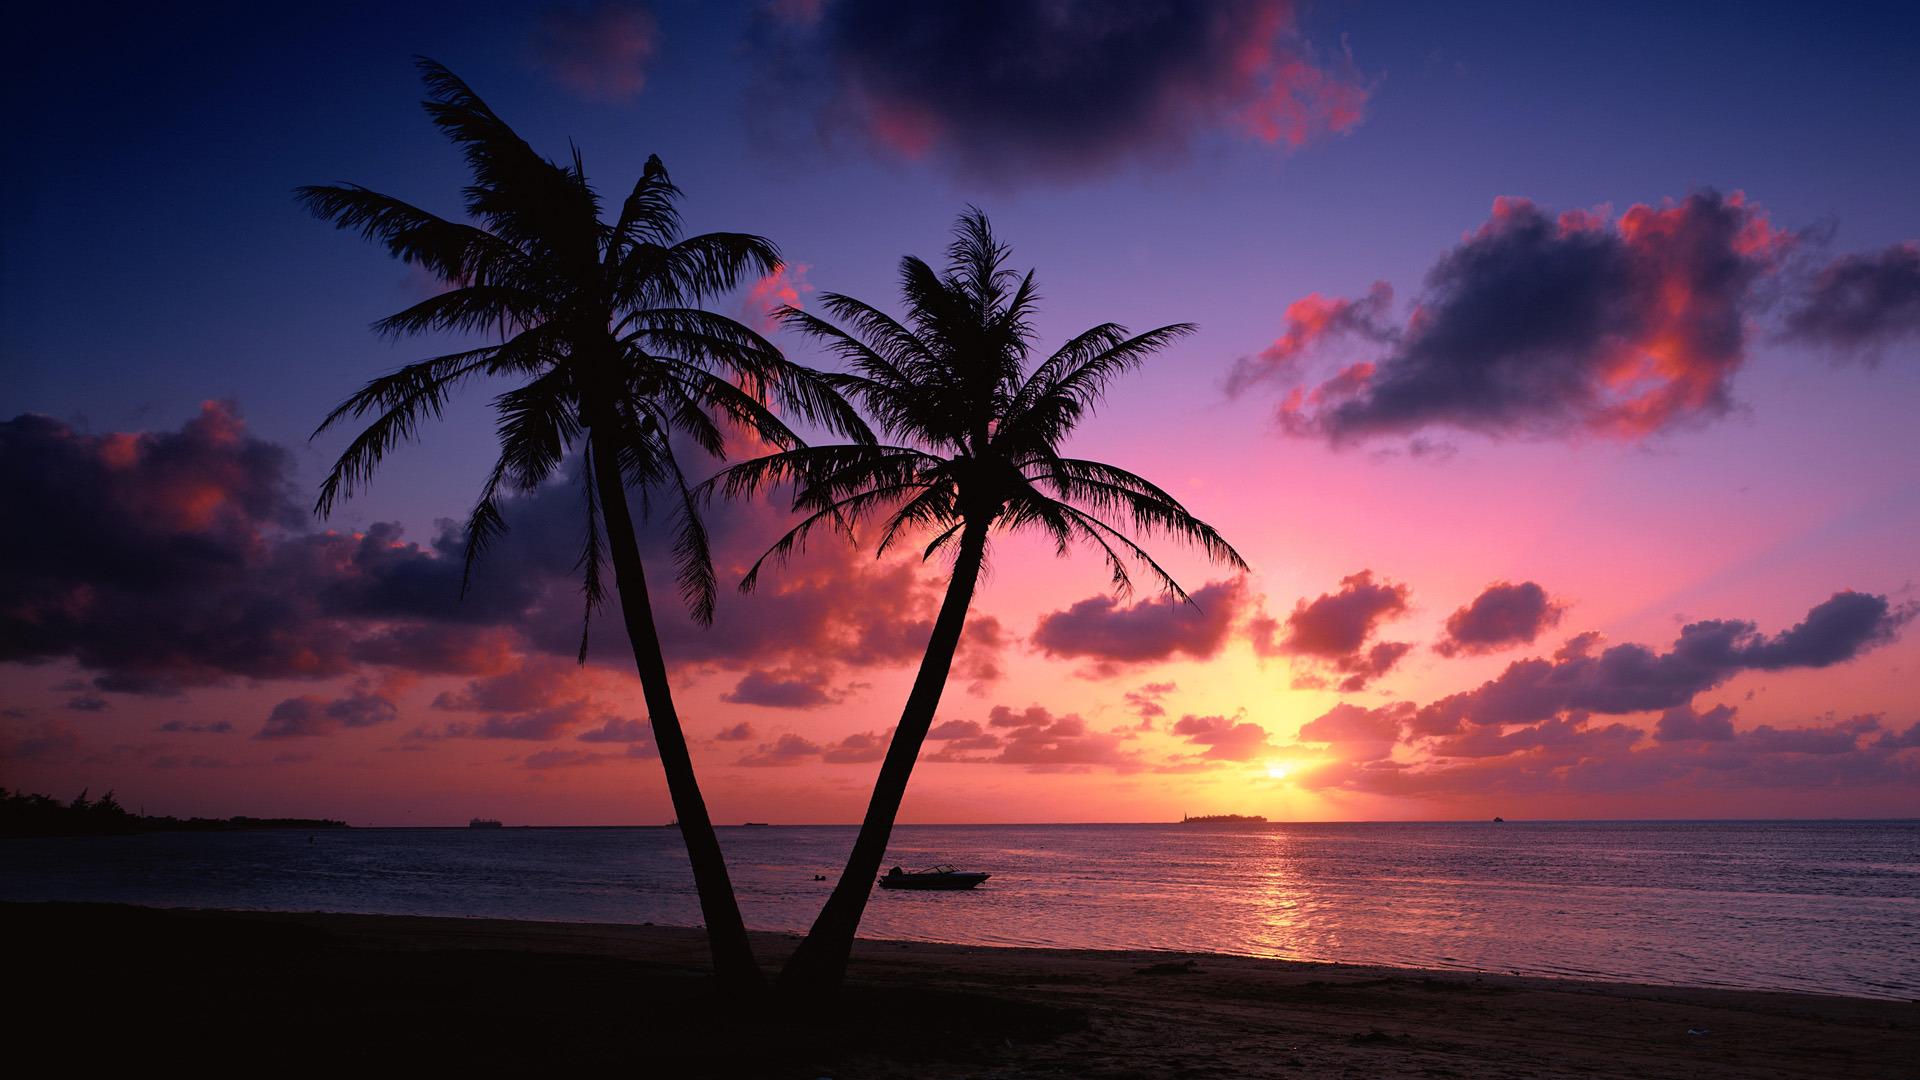 Beach Sunset Landscape